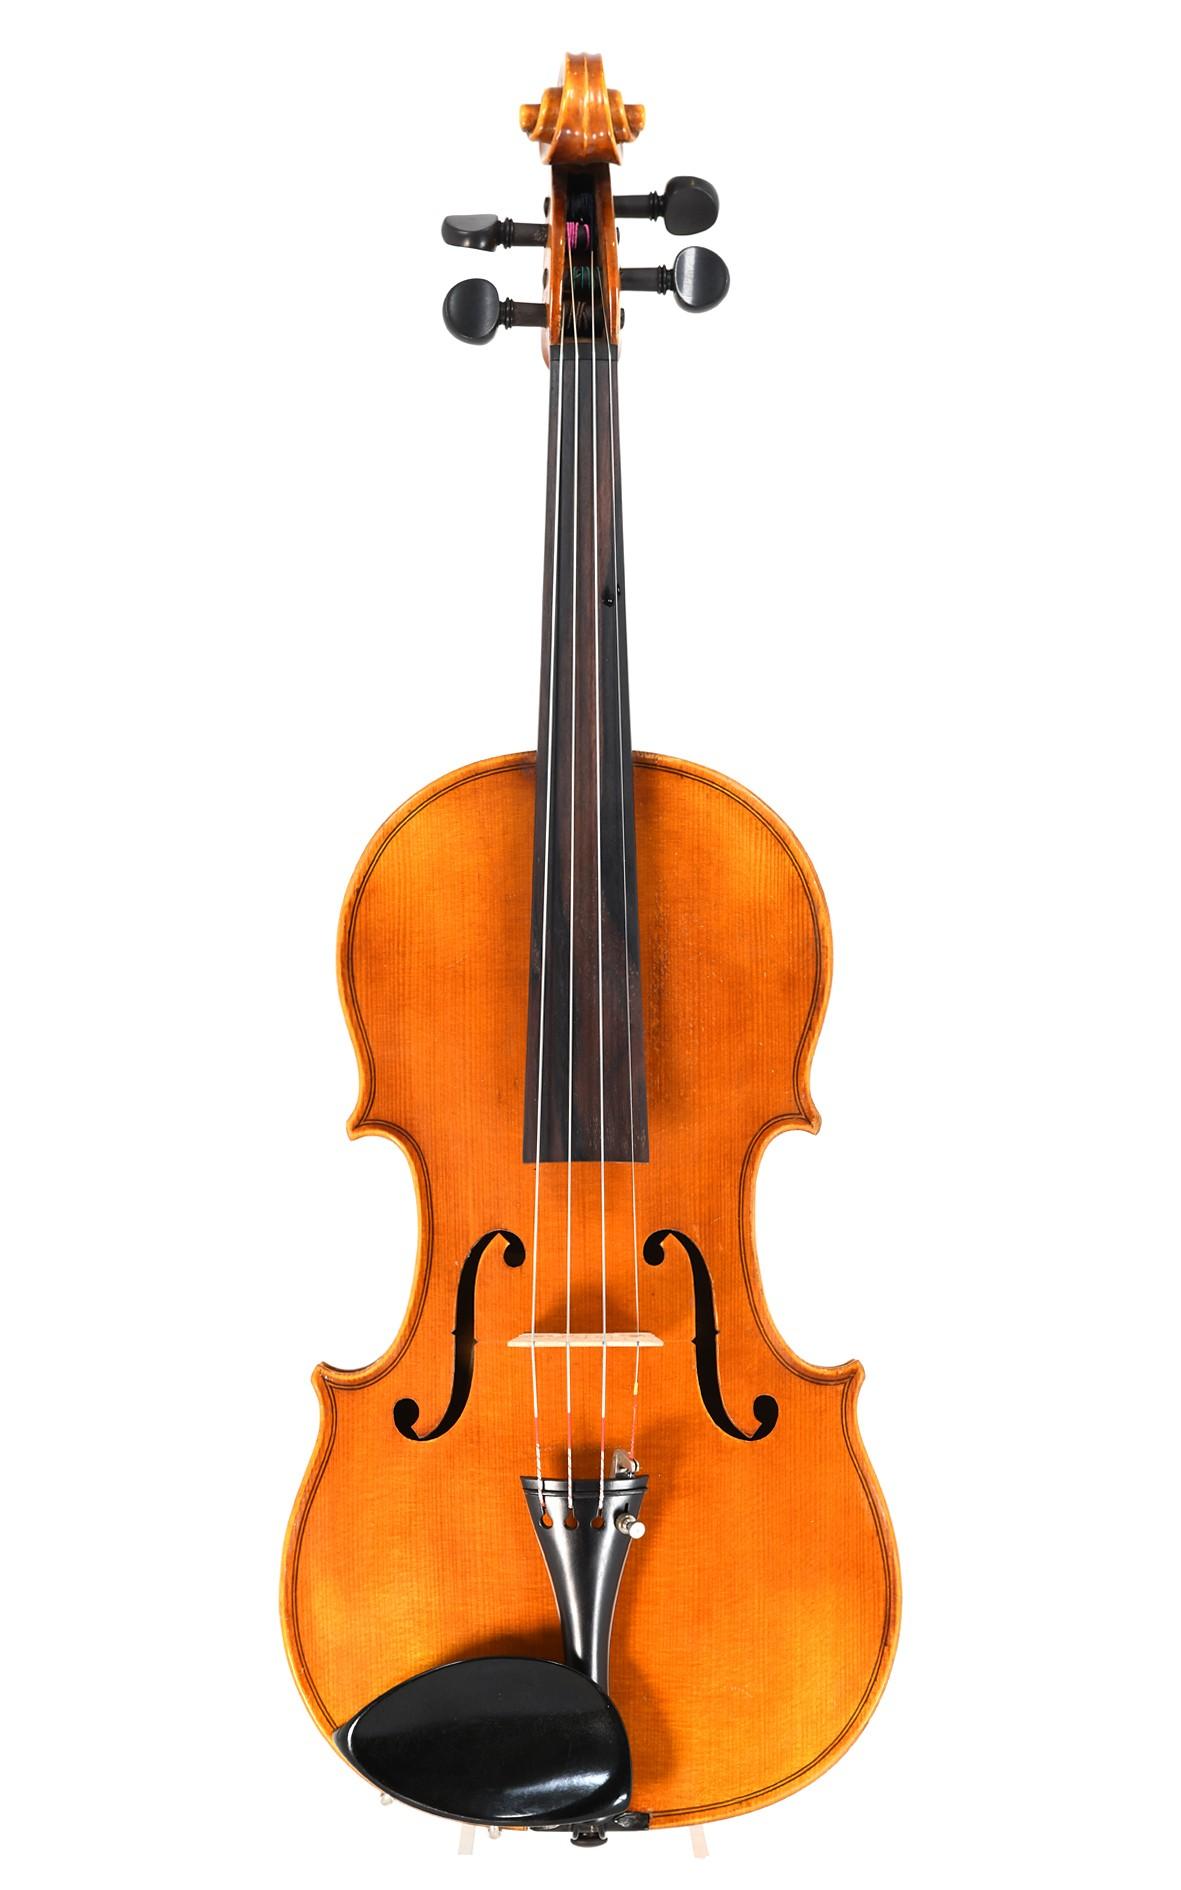 Mittenwald violin from the Bitterer workshops